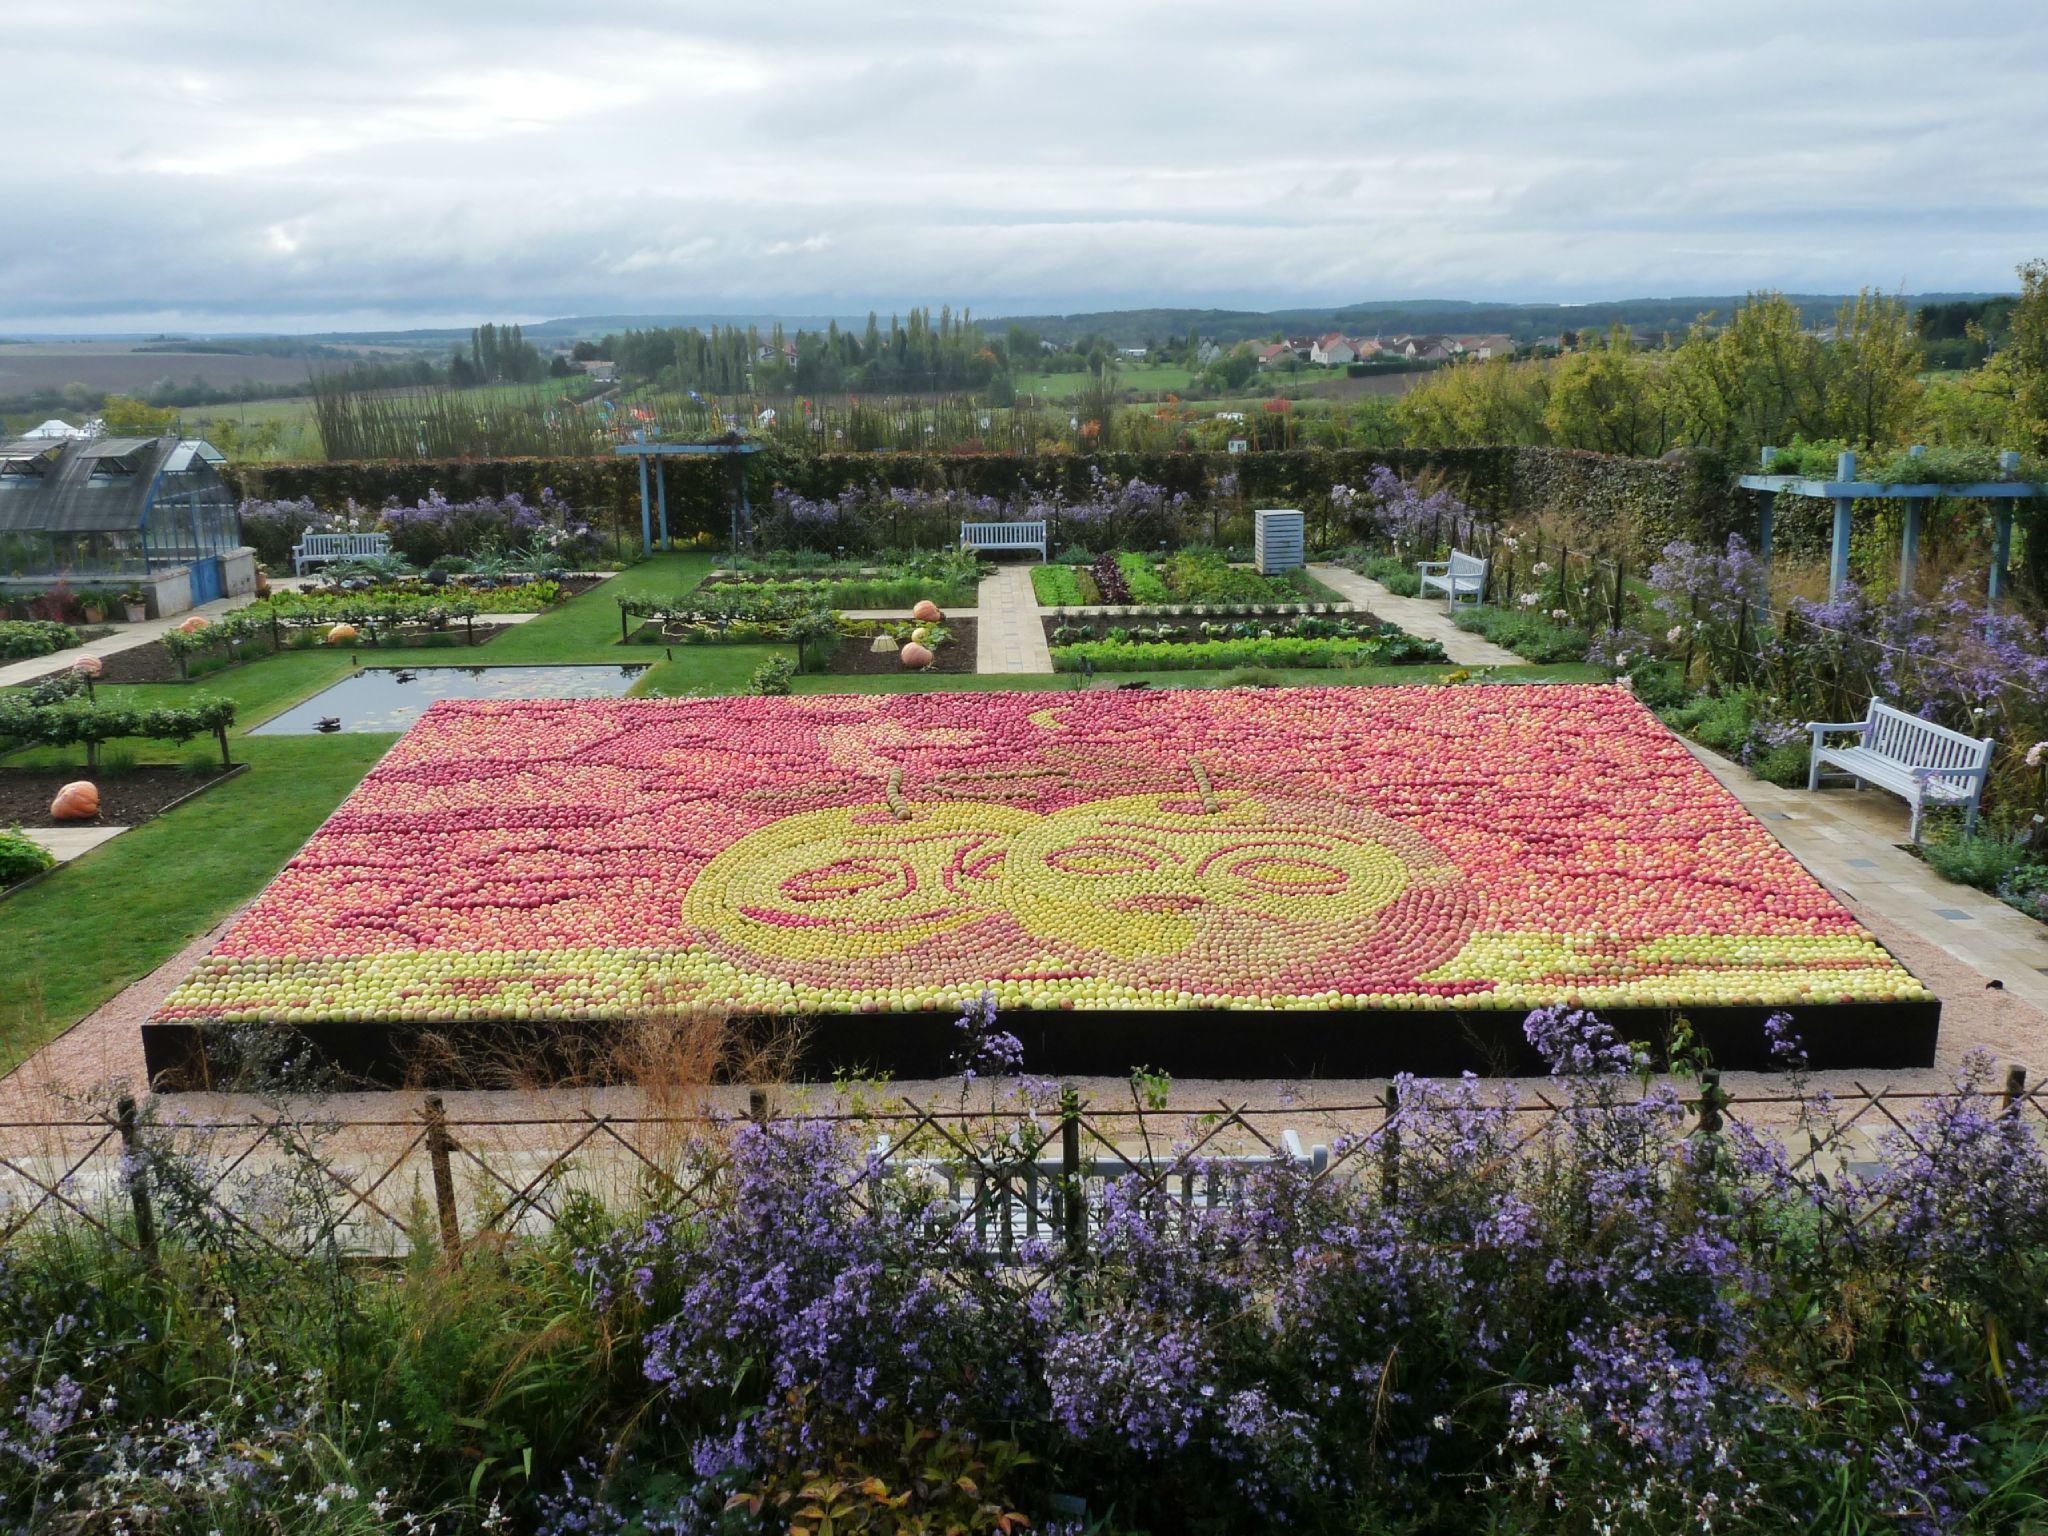 Les jardins fruitiers de 57 laquenexy sous ma gloriette - Jardins fruitiers de laquenexy ...